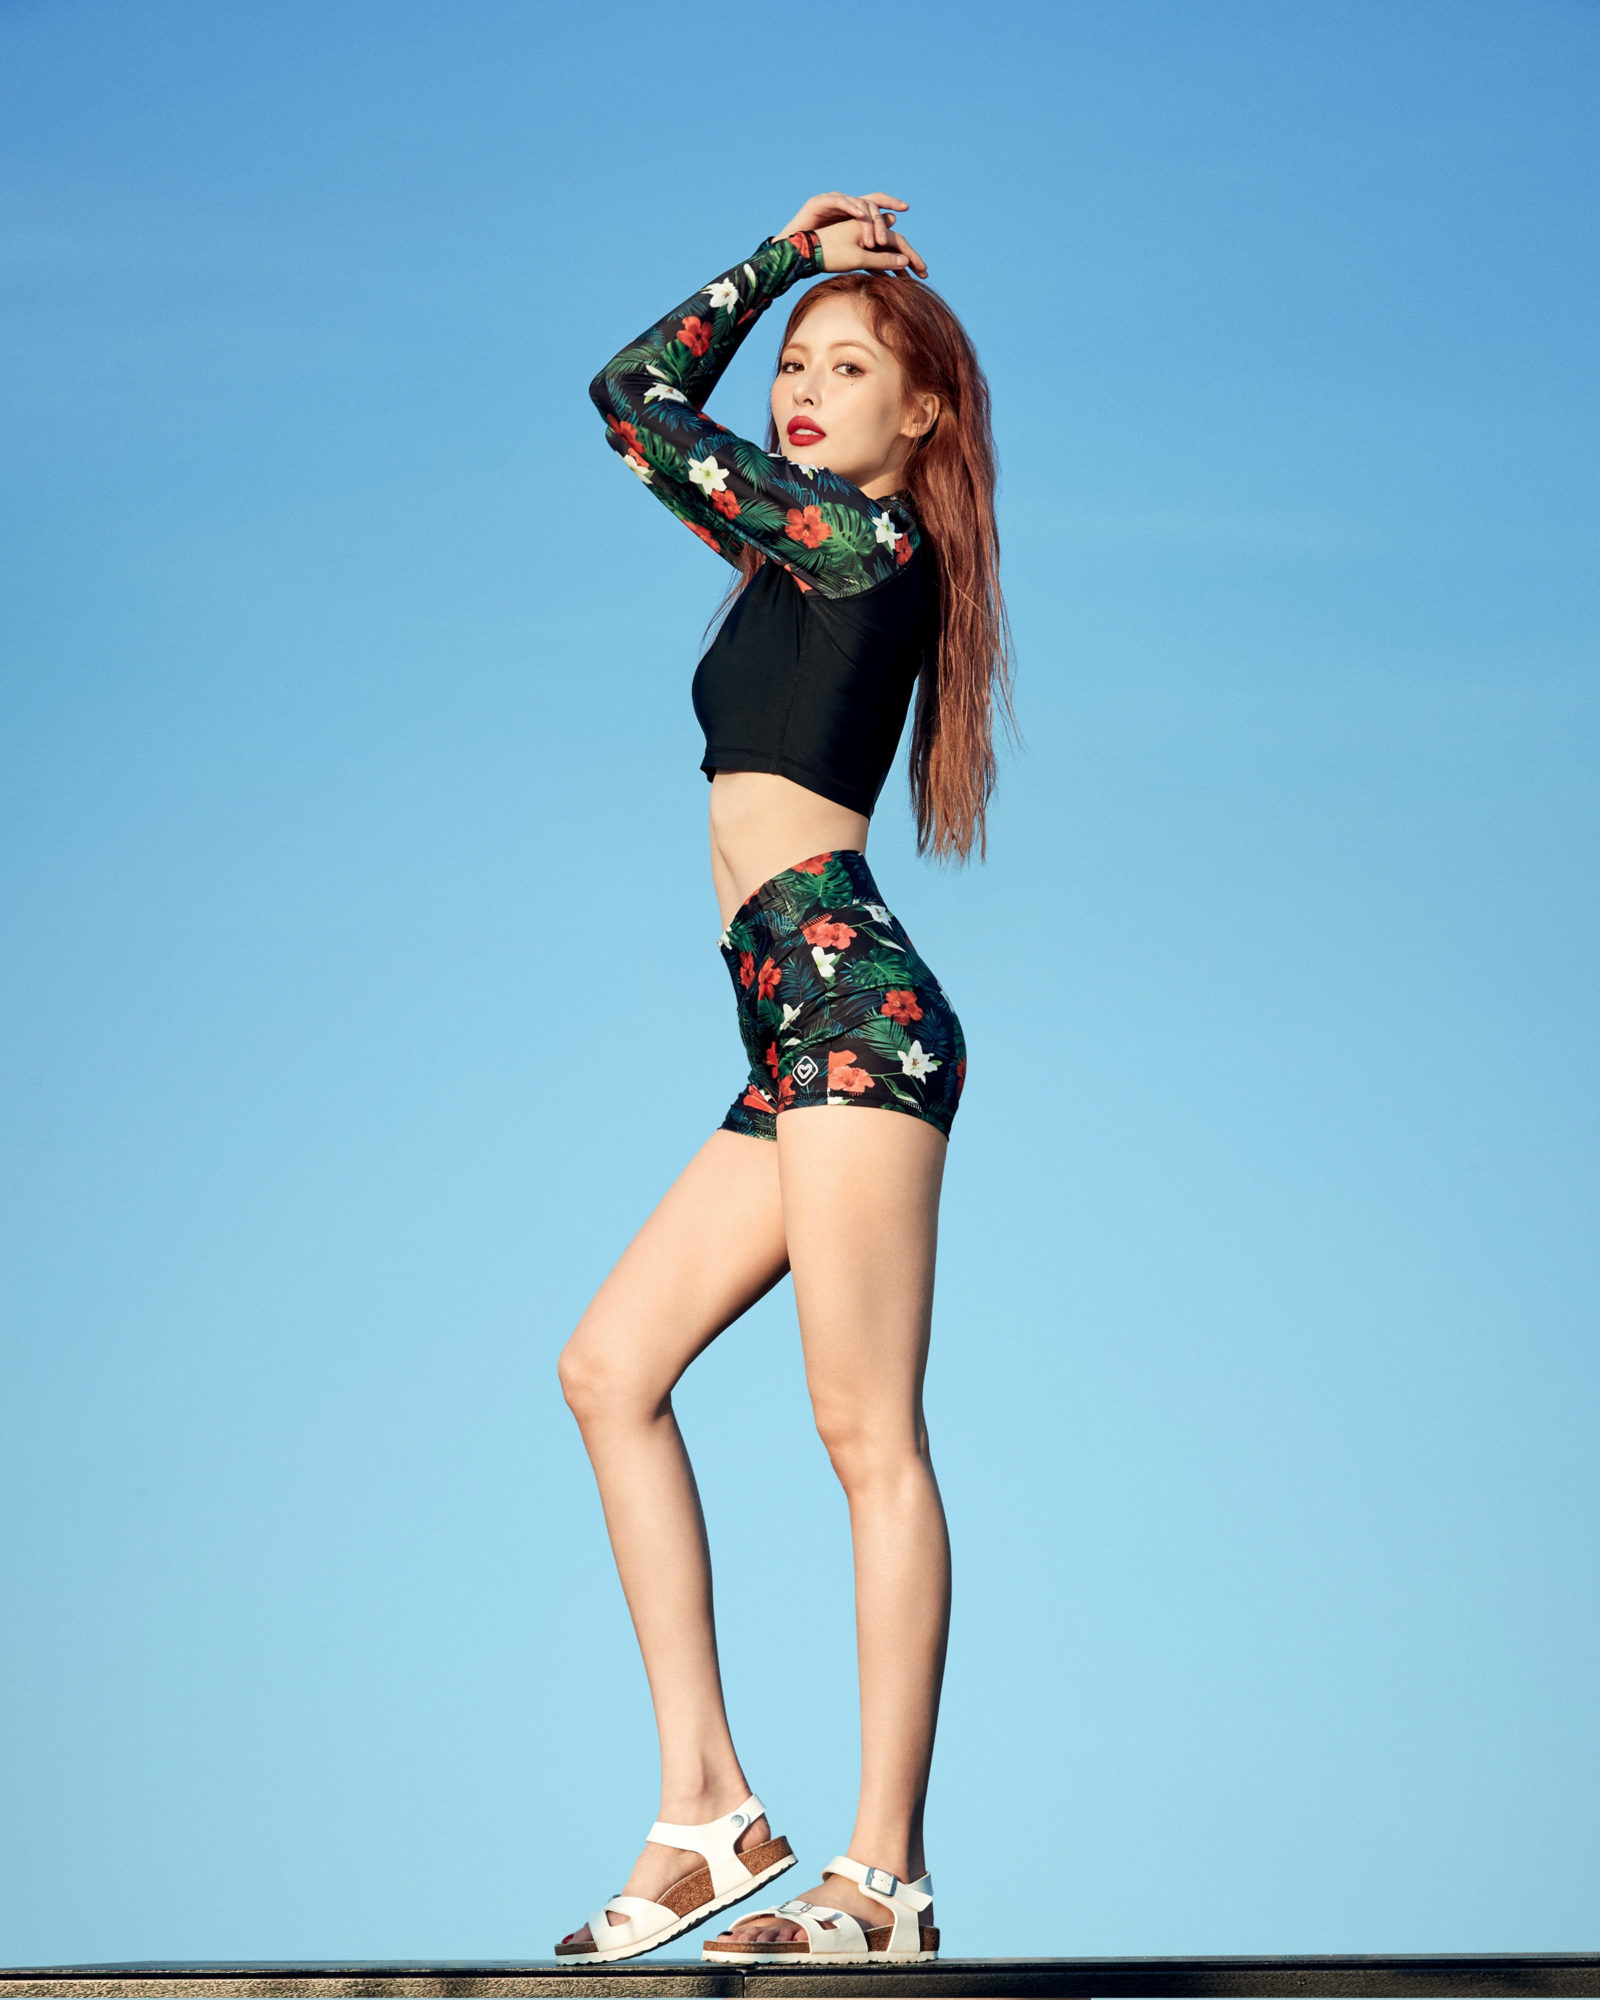 Hyuna CLRIDE.n Pictorial Summer 2019 (HD/HR) - K-Pop ...Hyuna 2019 Pics